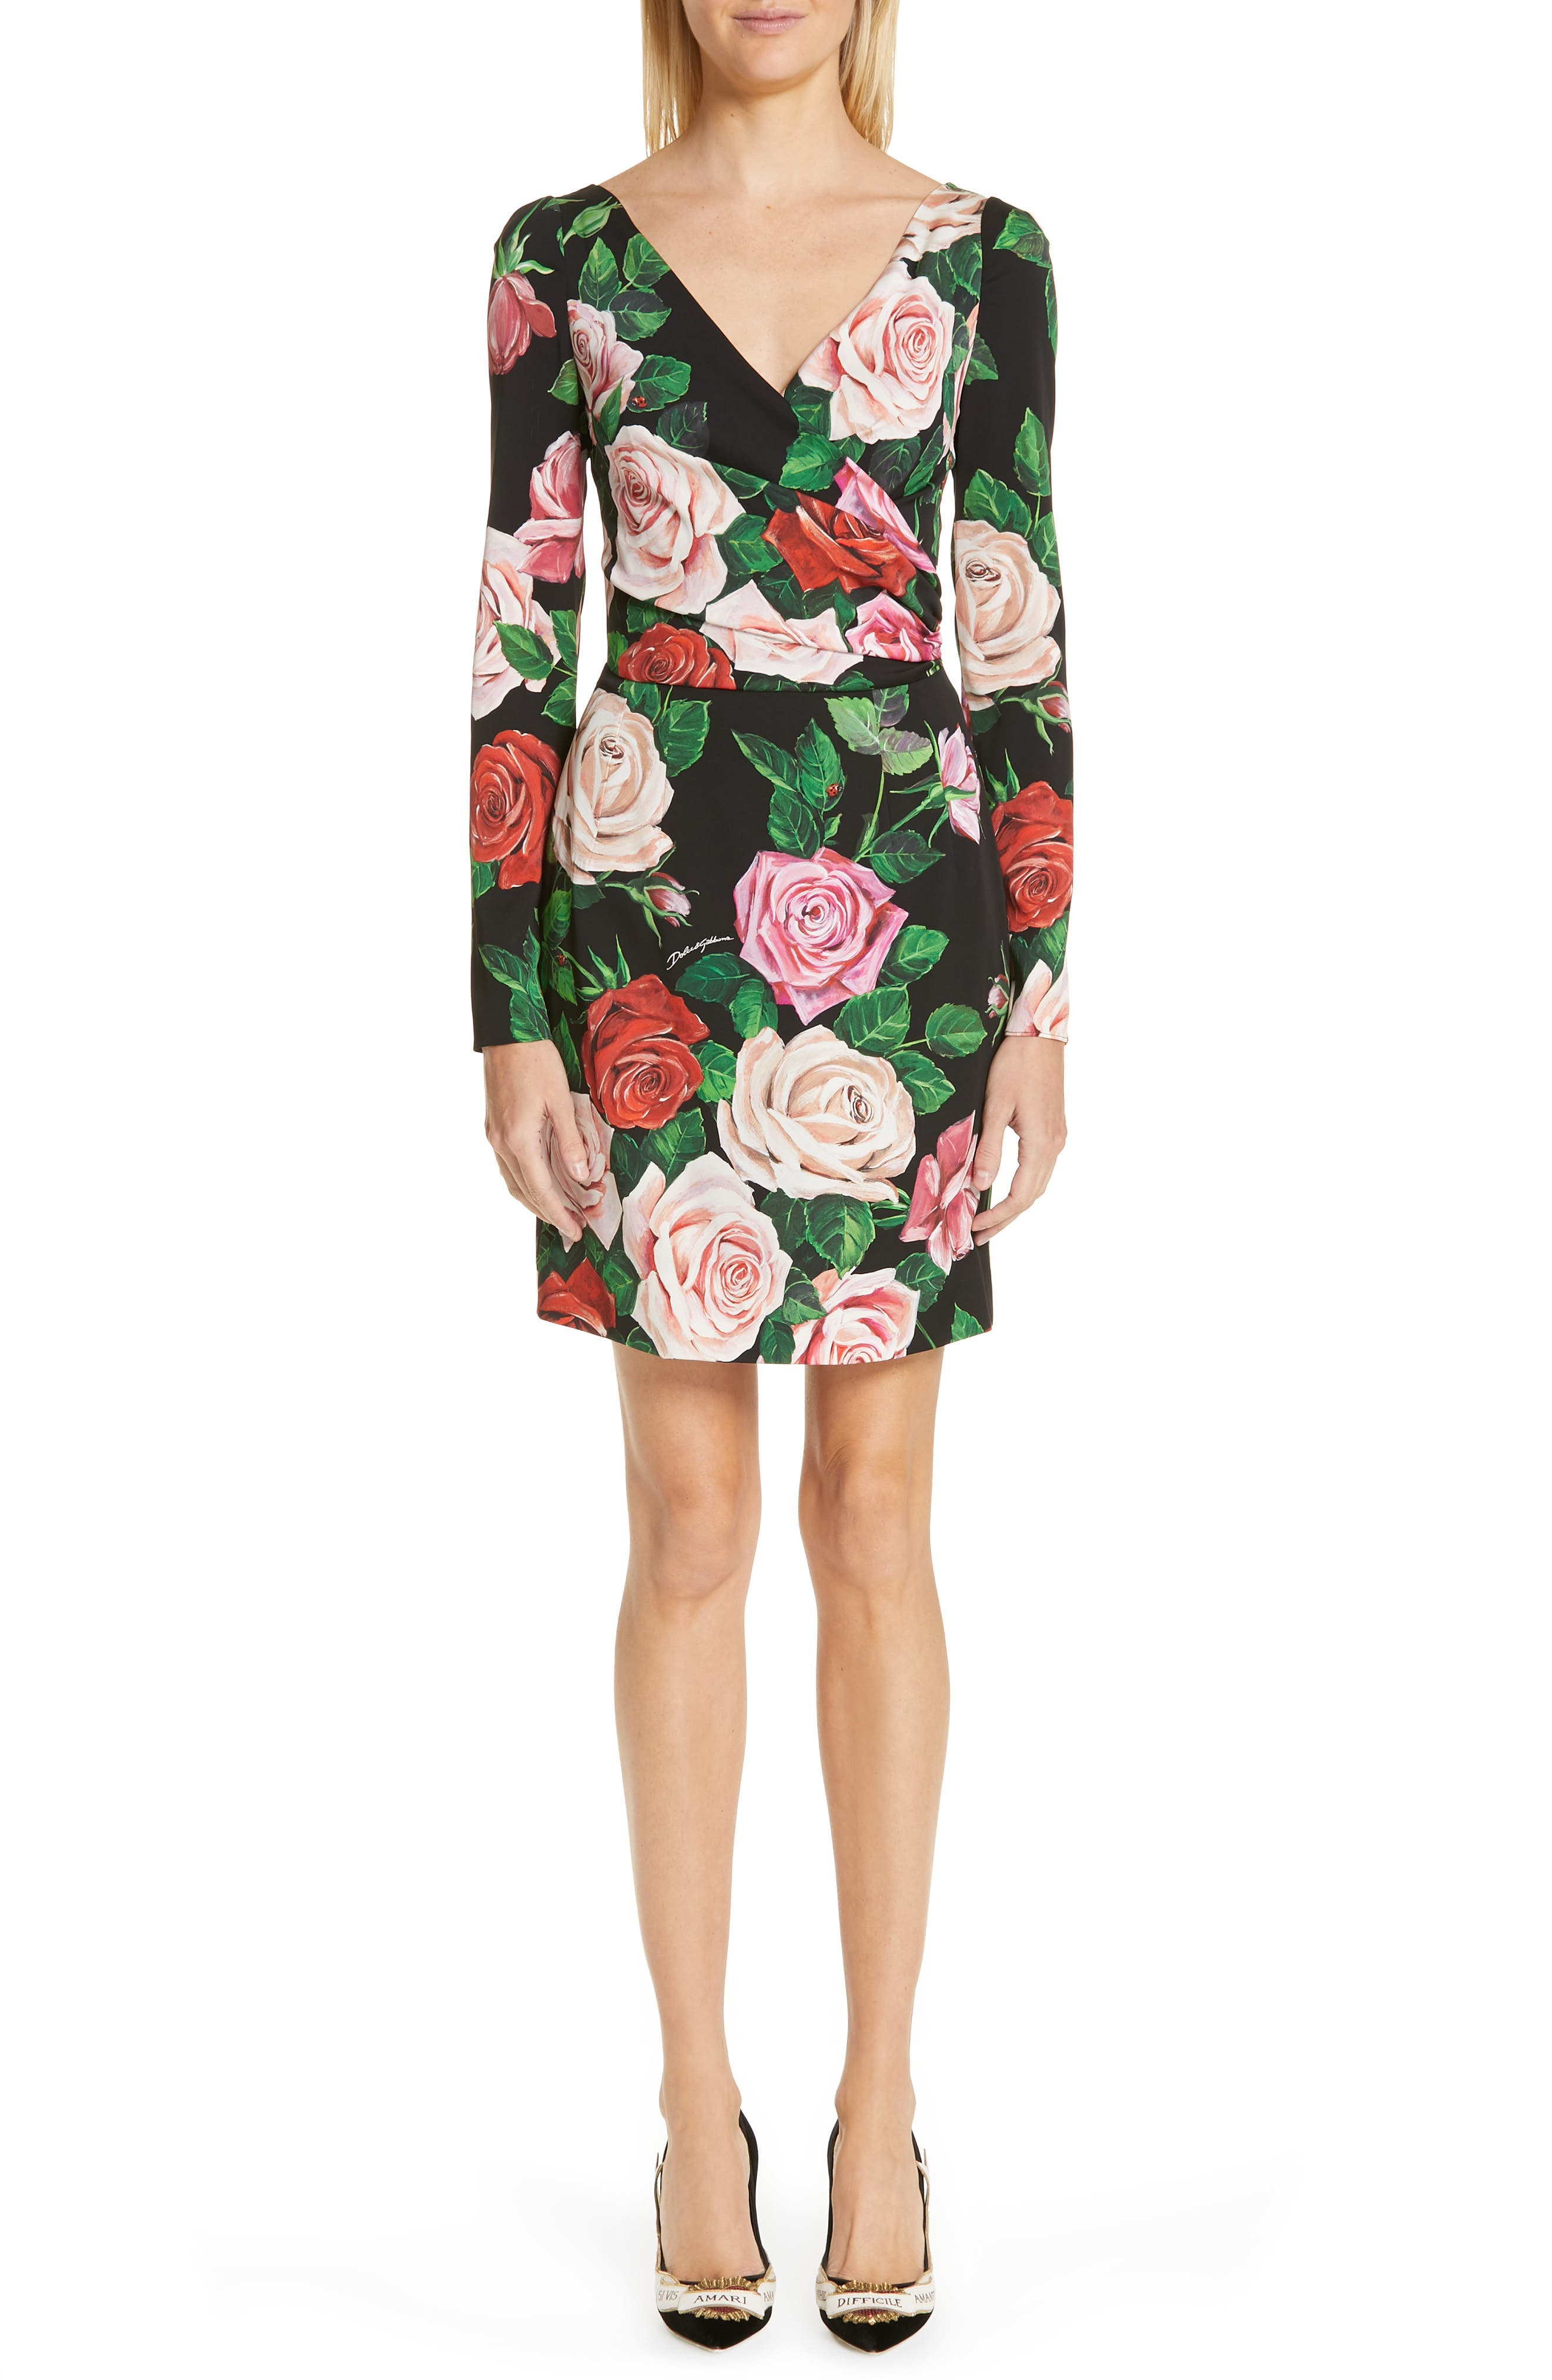 Dolce & gabbana Rose Print Stretch Silk Dress, US / 40 IT - Black